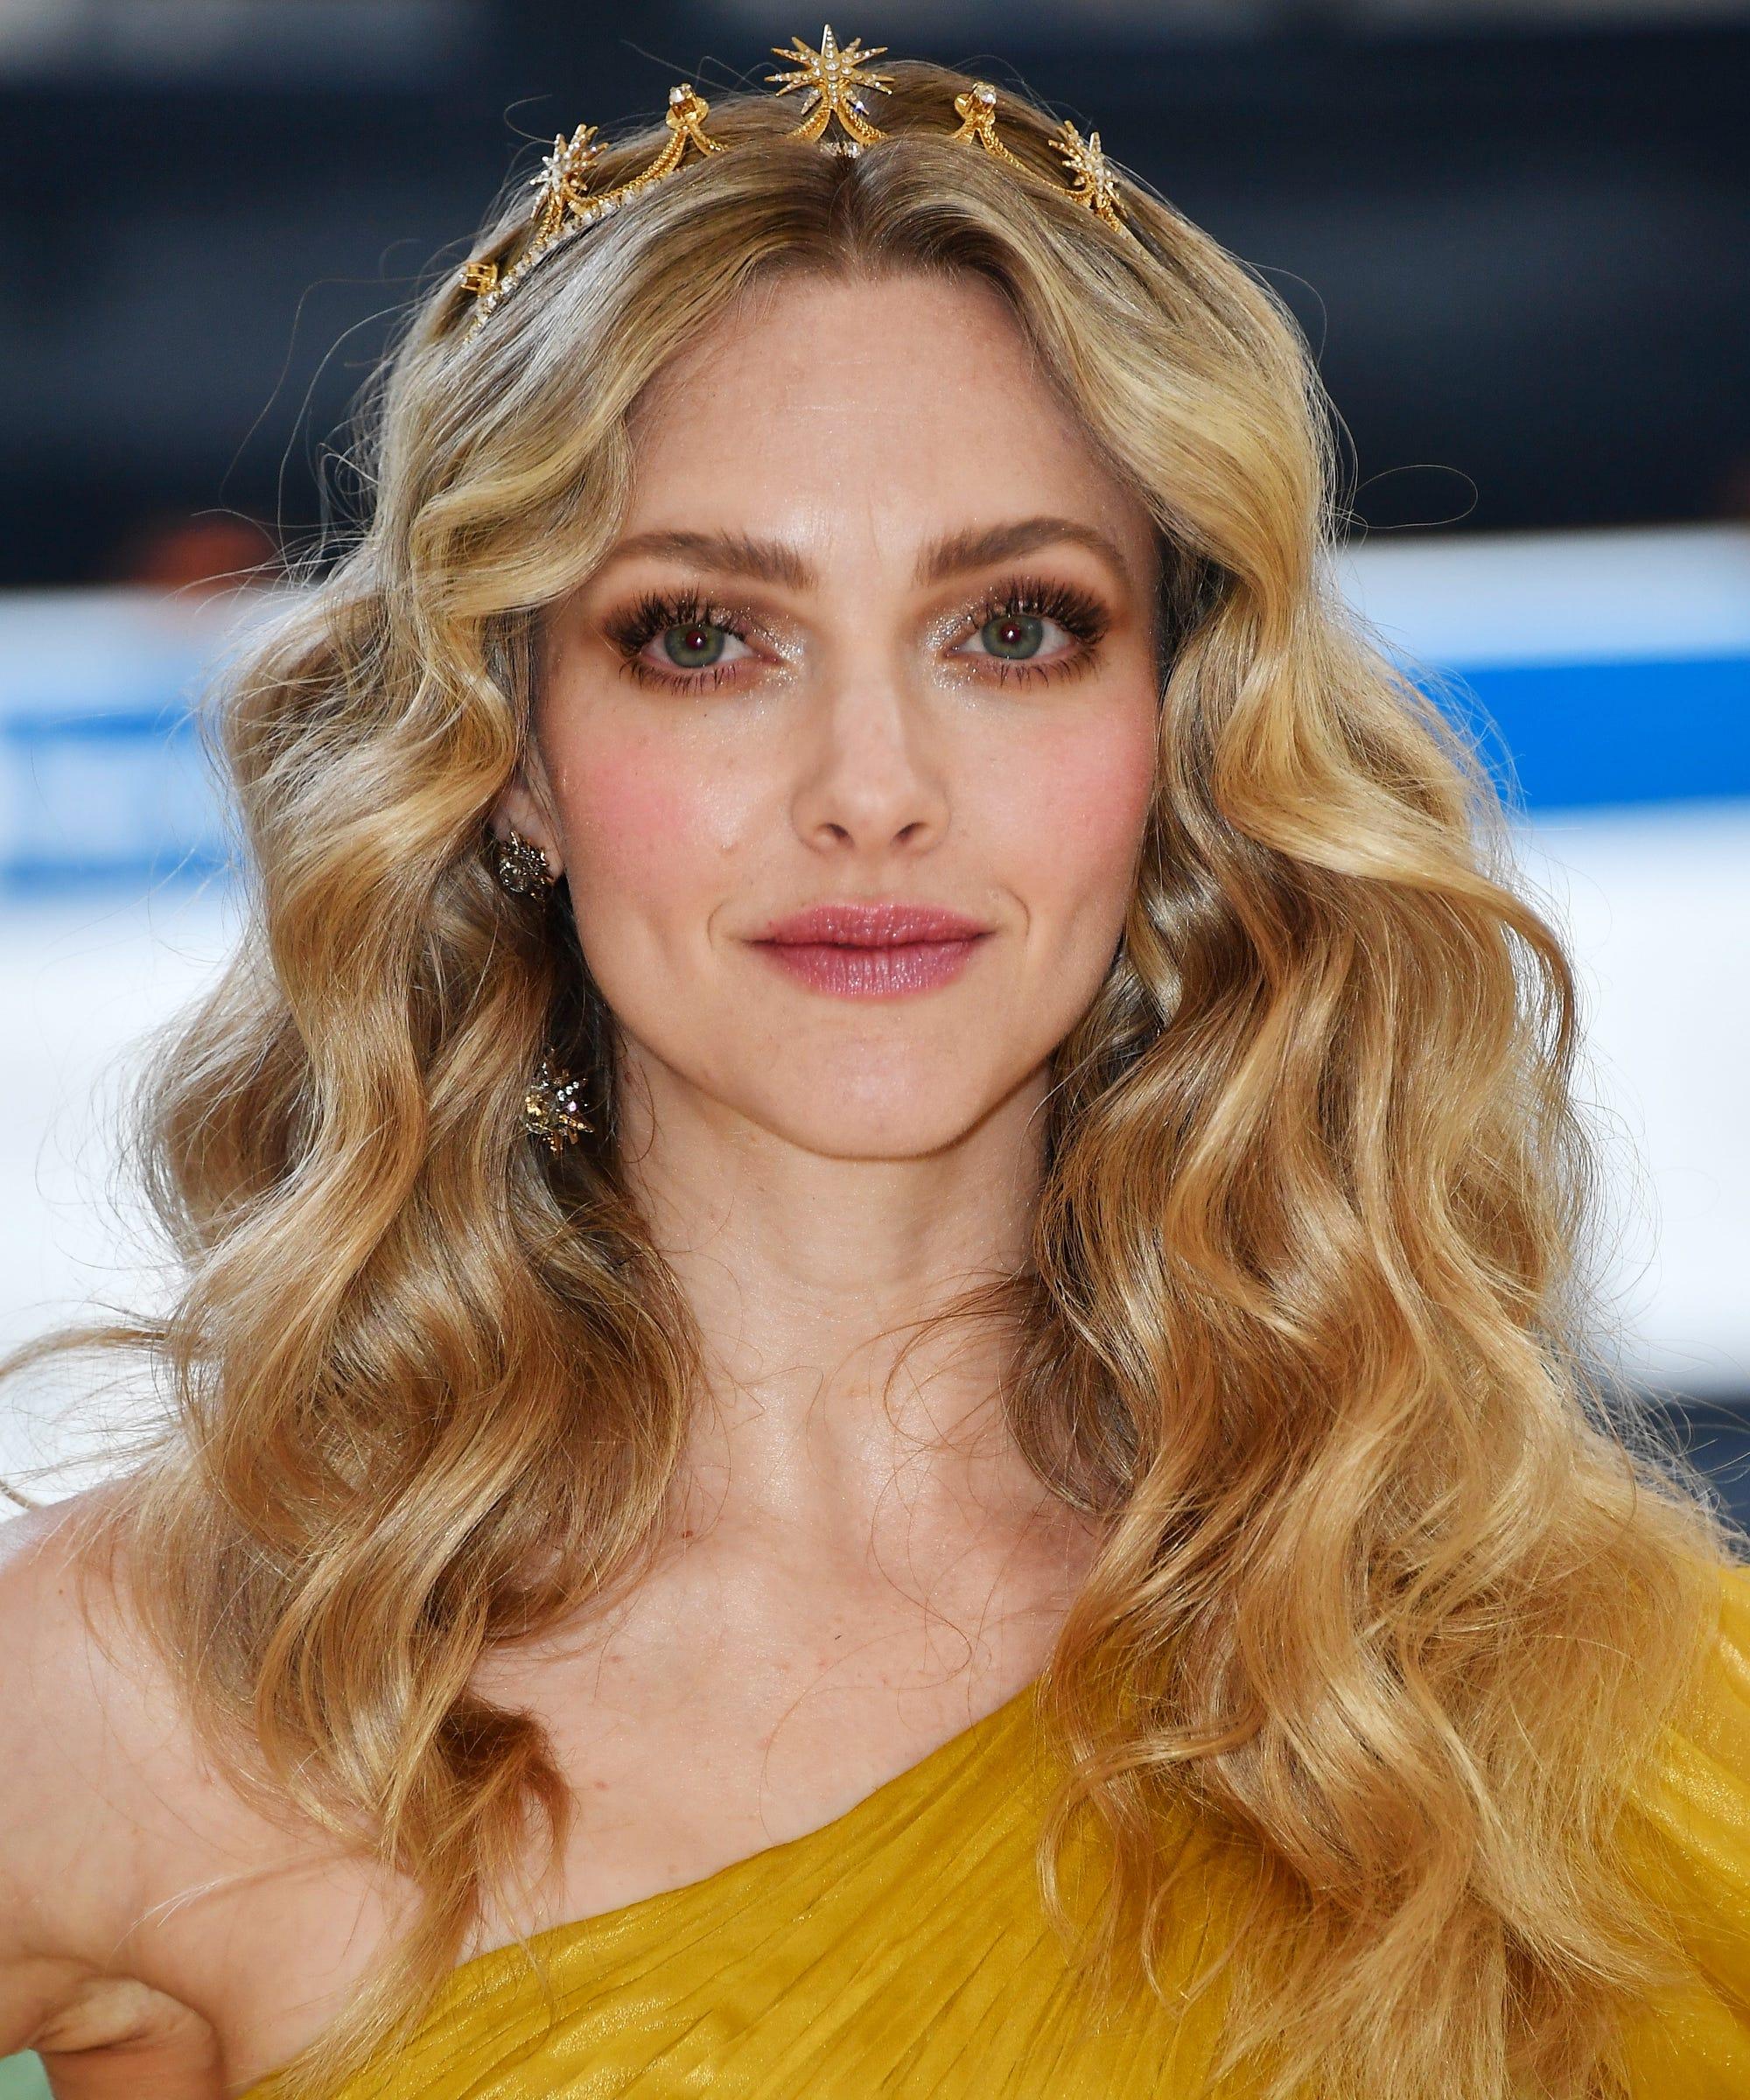 Amanda Seyfried Best Hair Makeup Looks For Mamma Mia 2